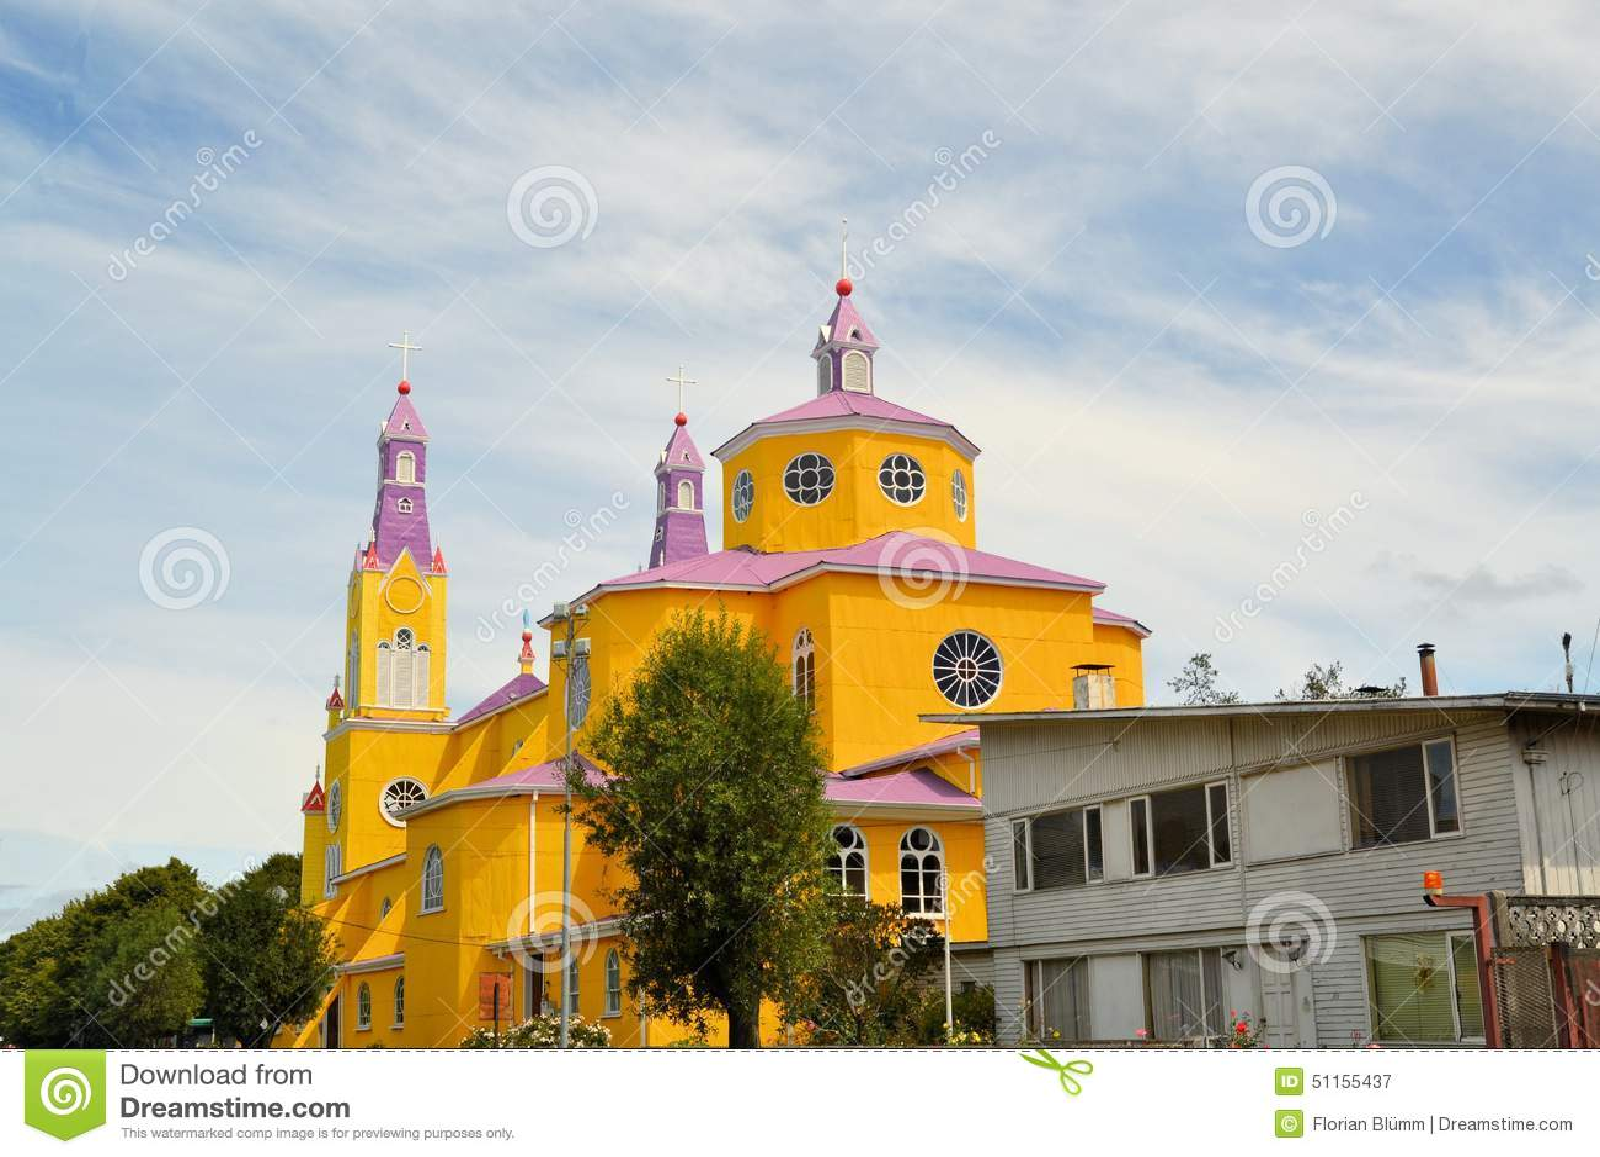 Yellow And Purple Church Of Castro, Chiloe, Chile Stock Photo ...